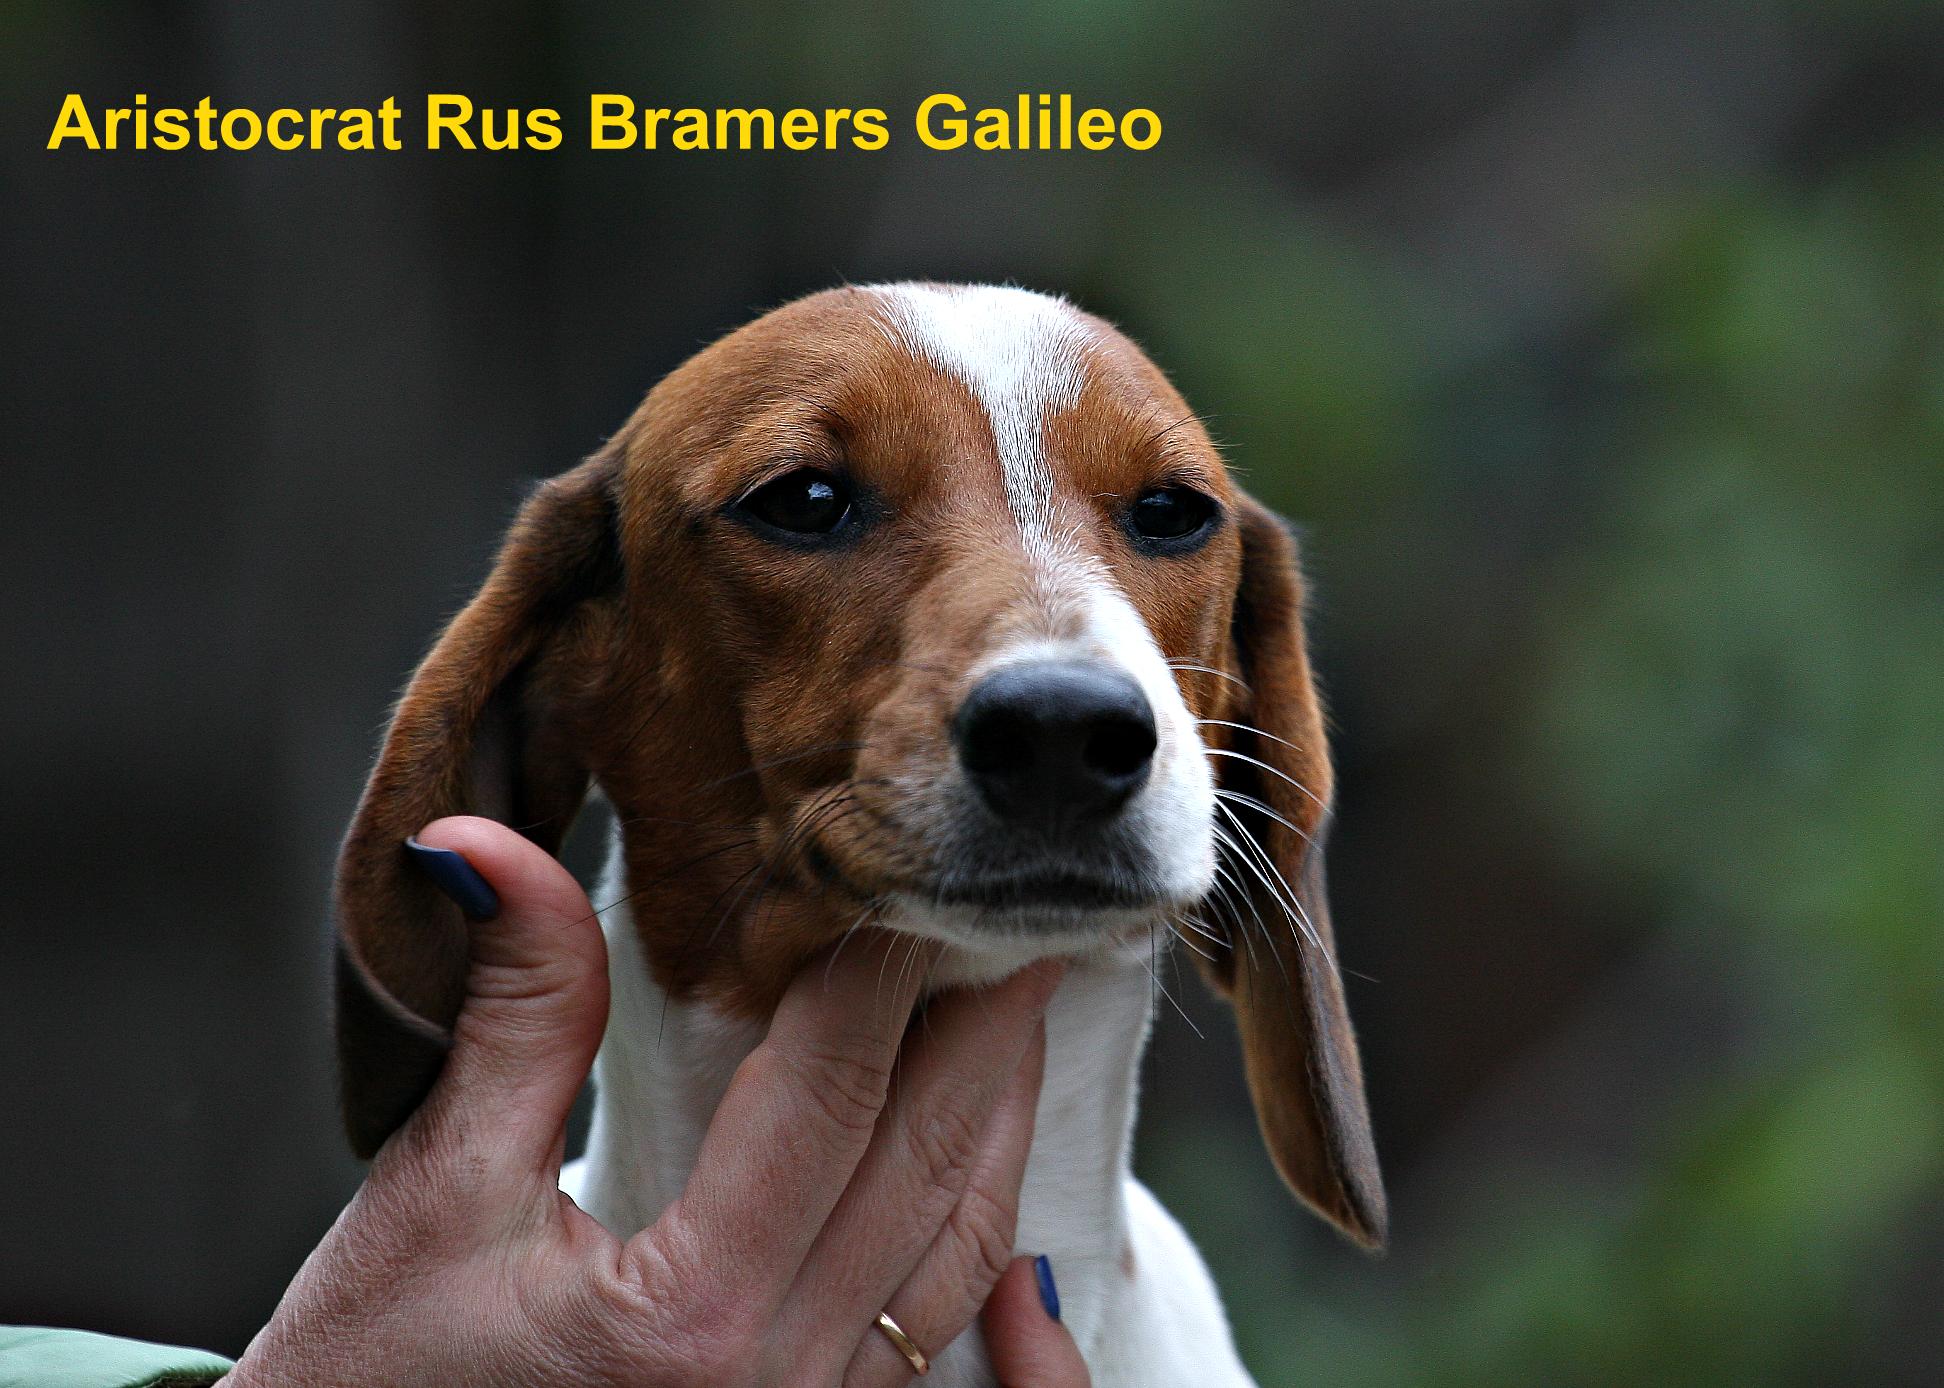 Aristocrat Rus Bramers Galileo